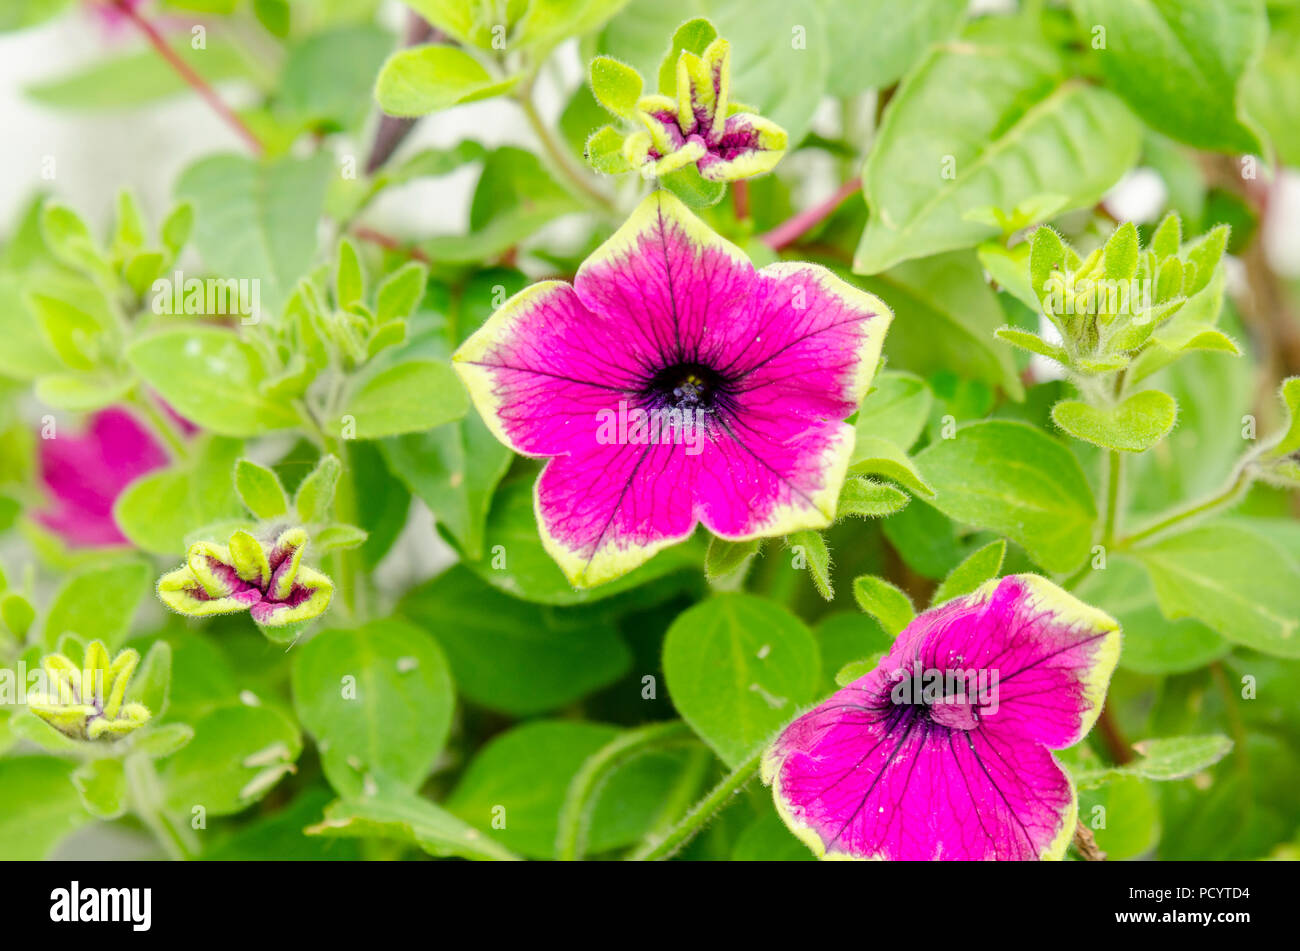 Petunia buzz purple flower, Petunioideae - Stock Image